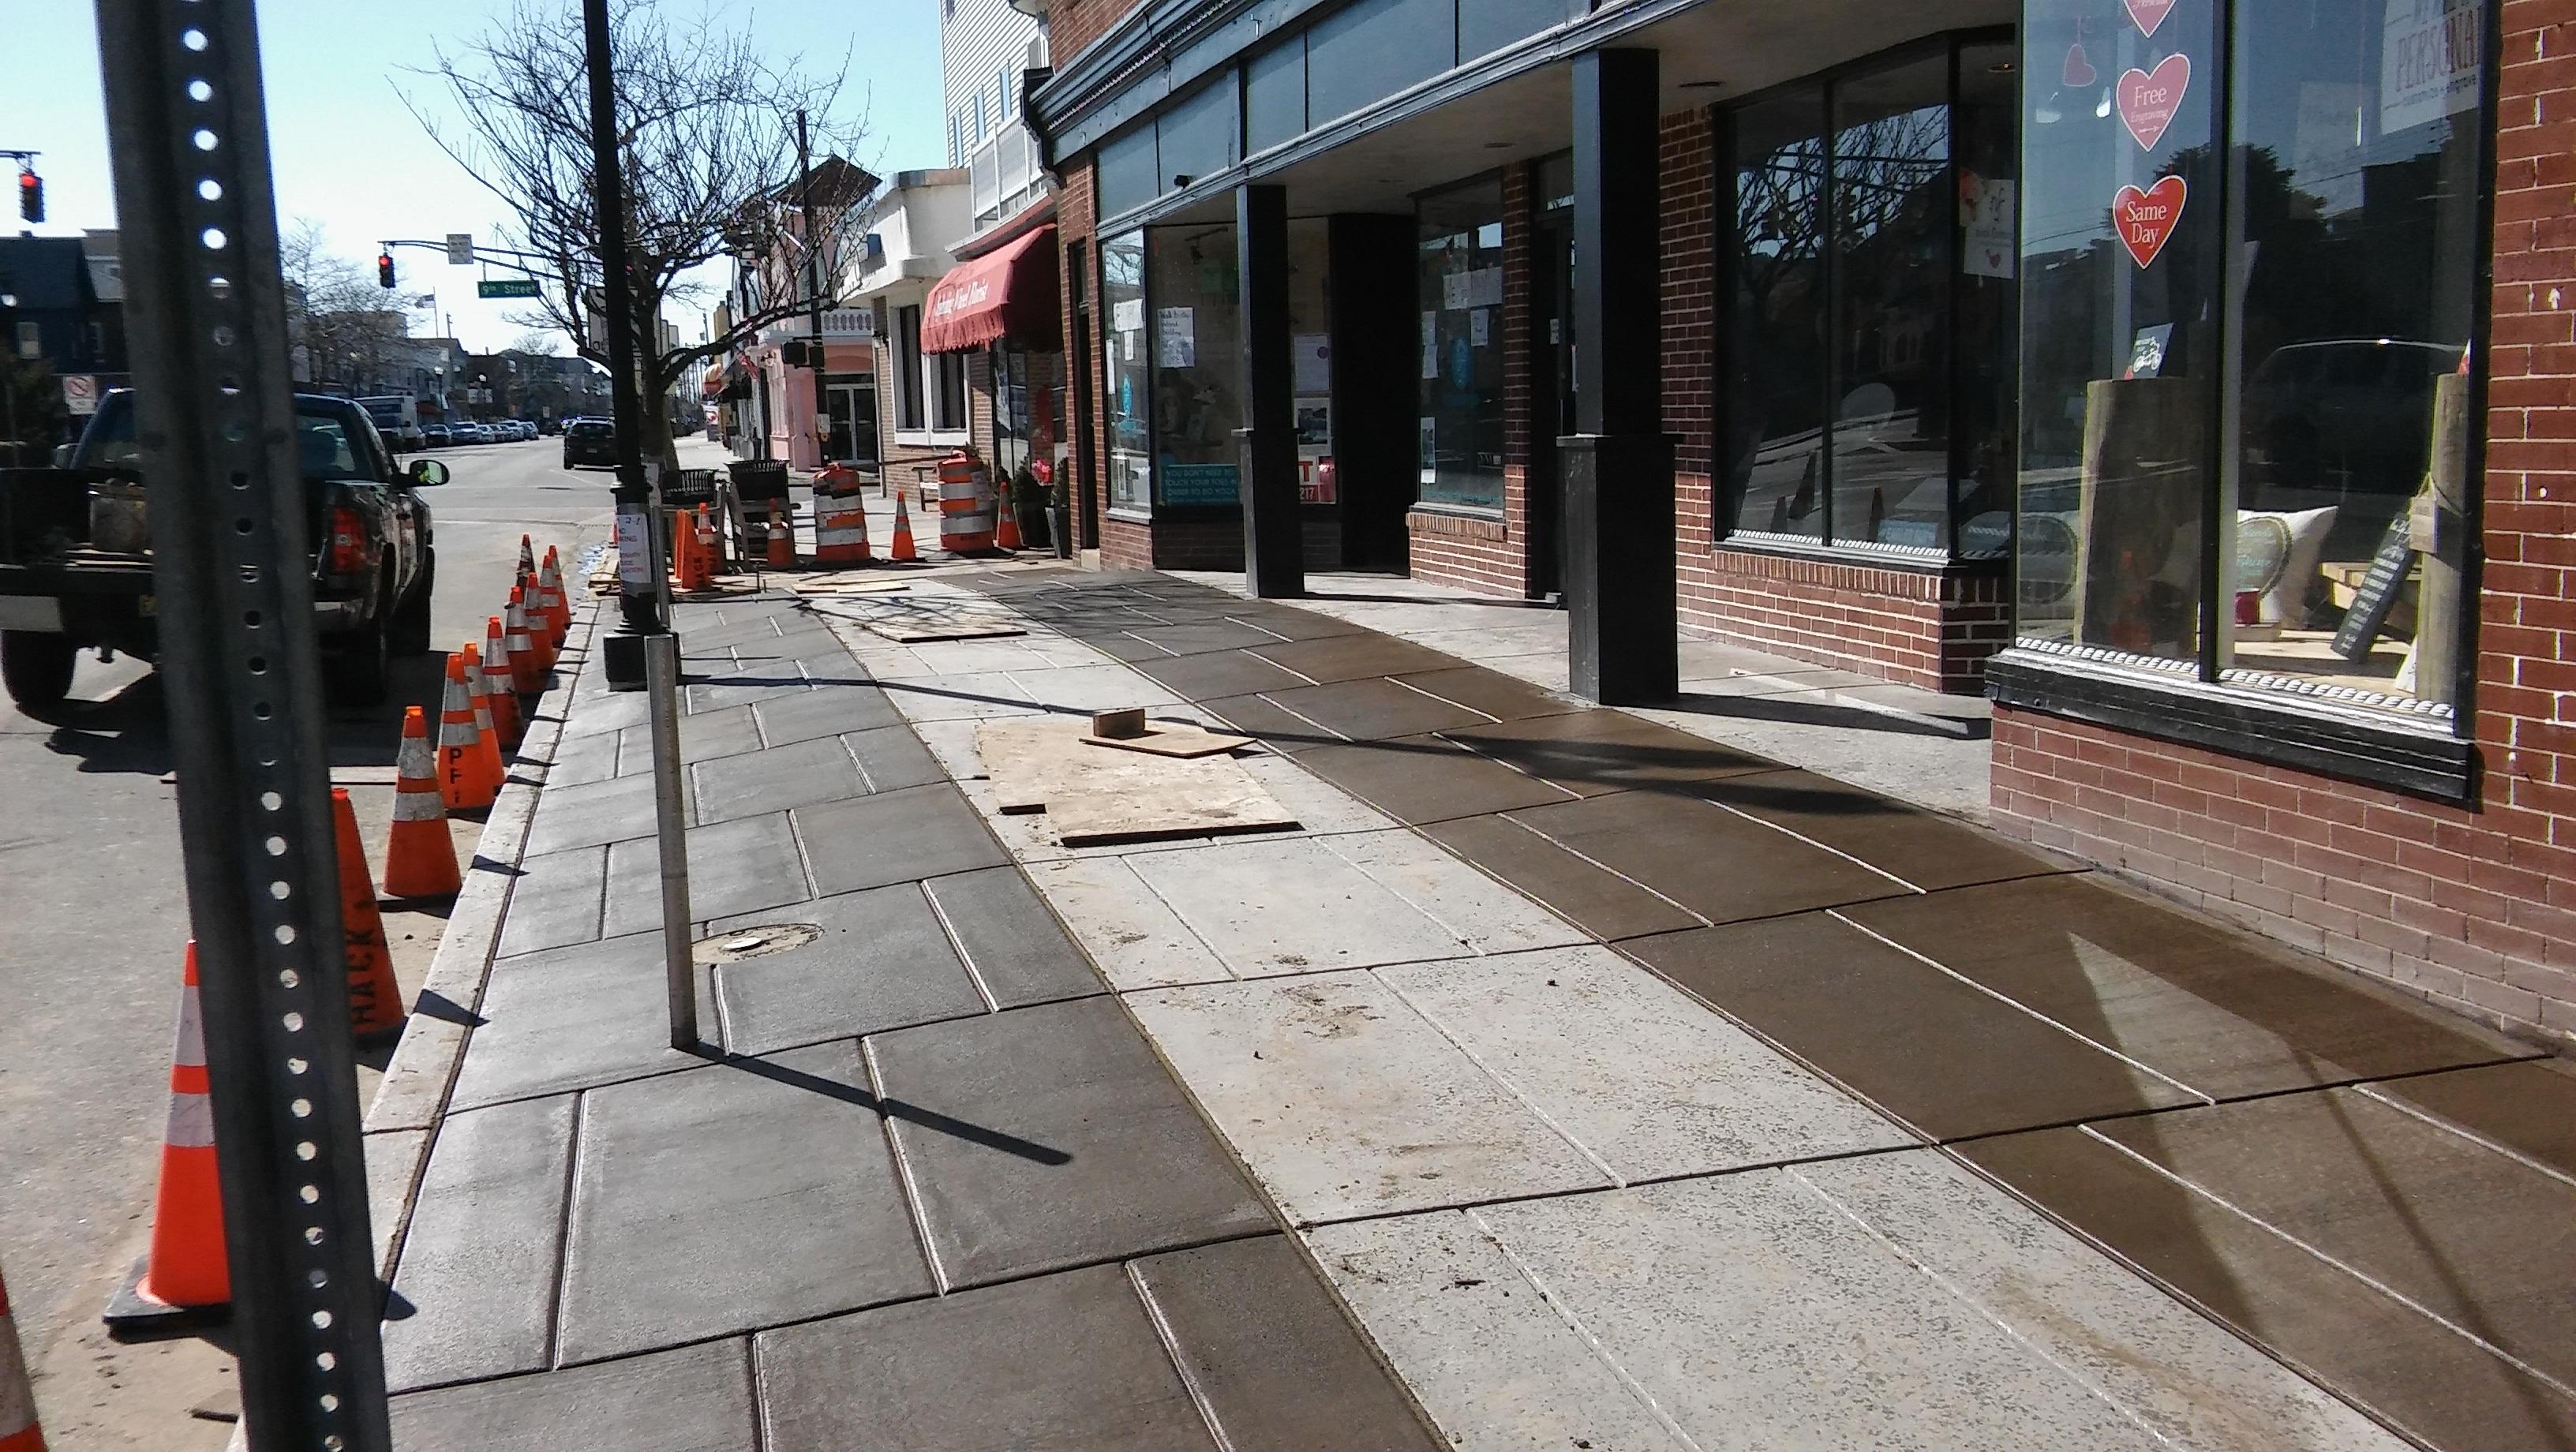 https://ocnjdaily.com/wp-content/uploads/2018/02/1.4-Sidewalks-by-Office.jpg